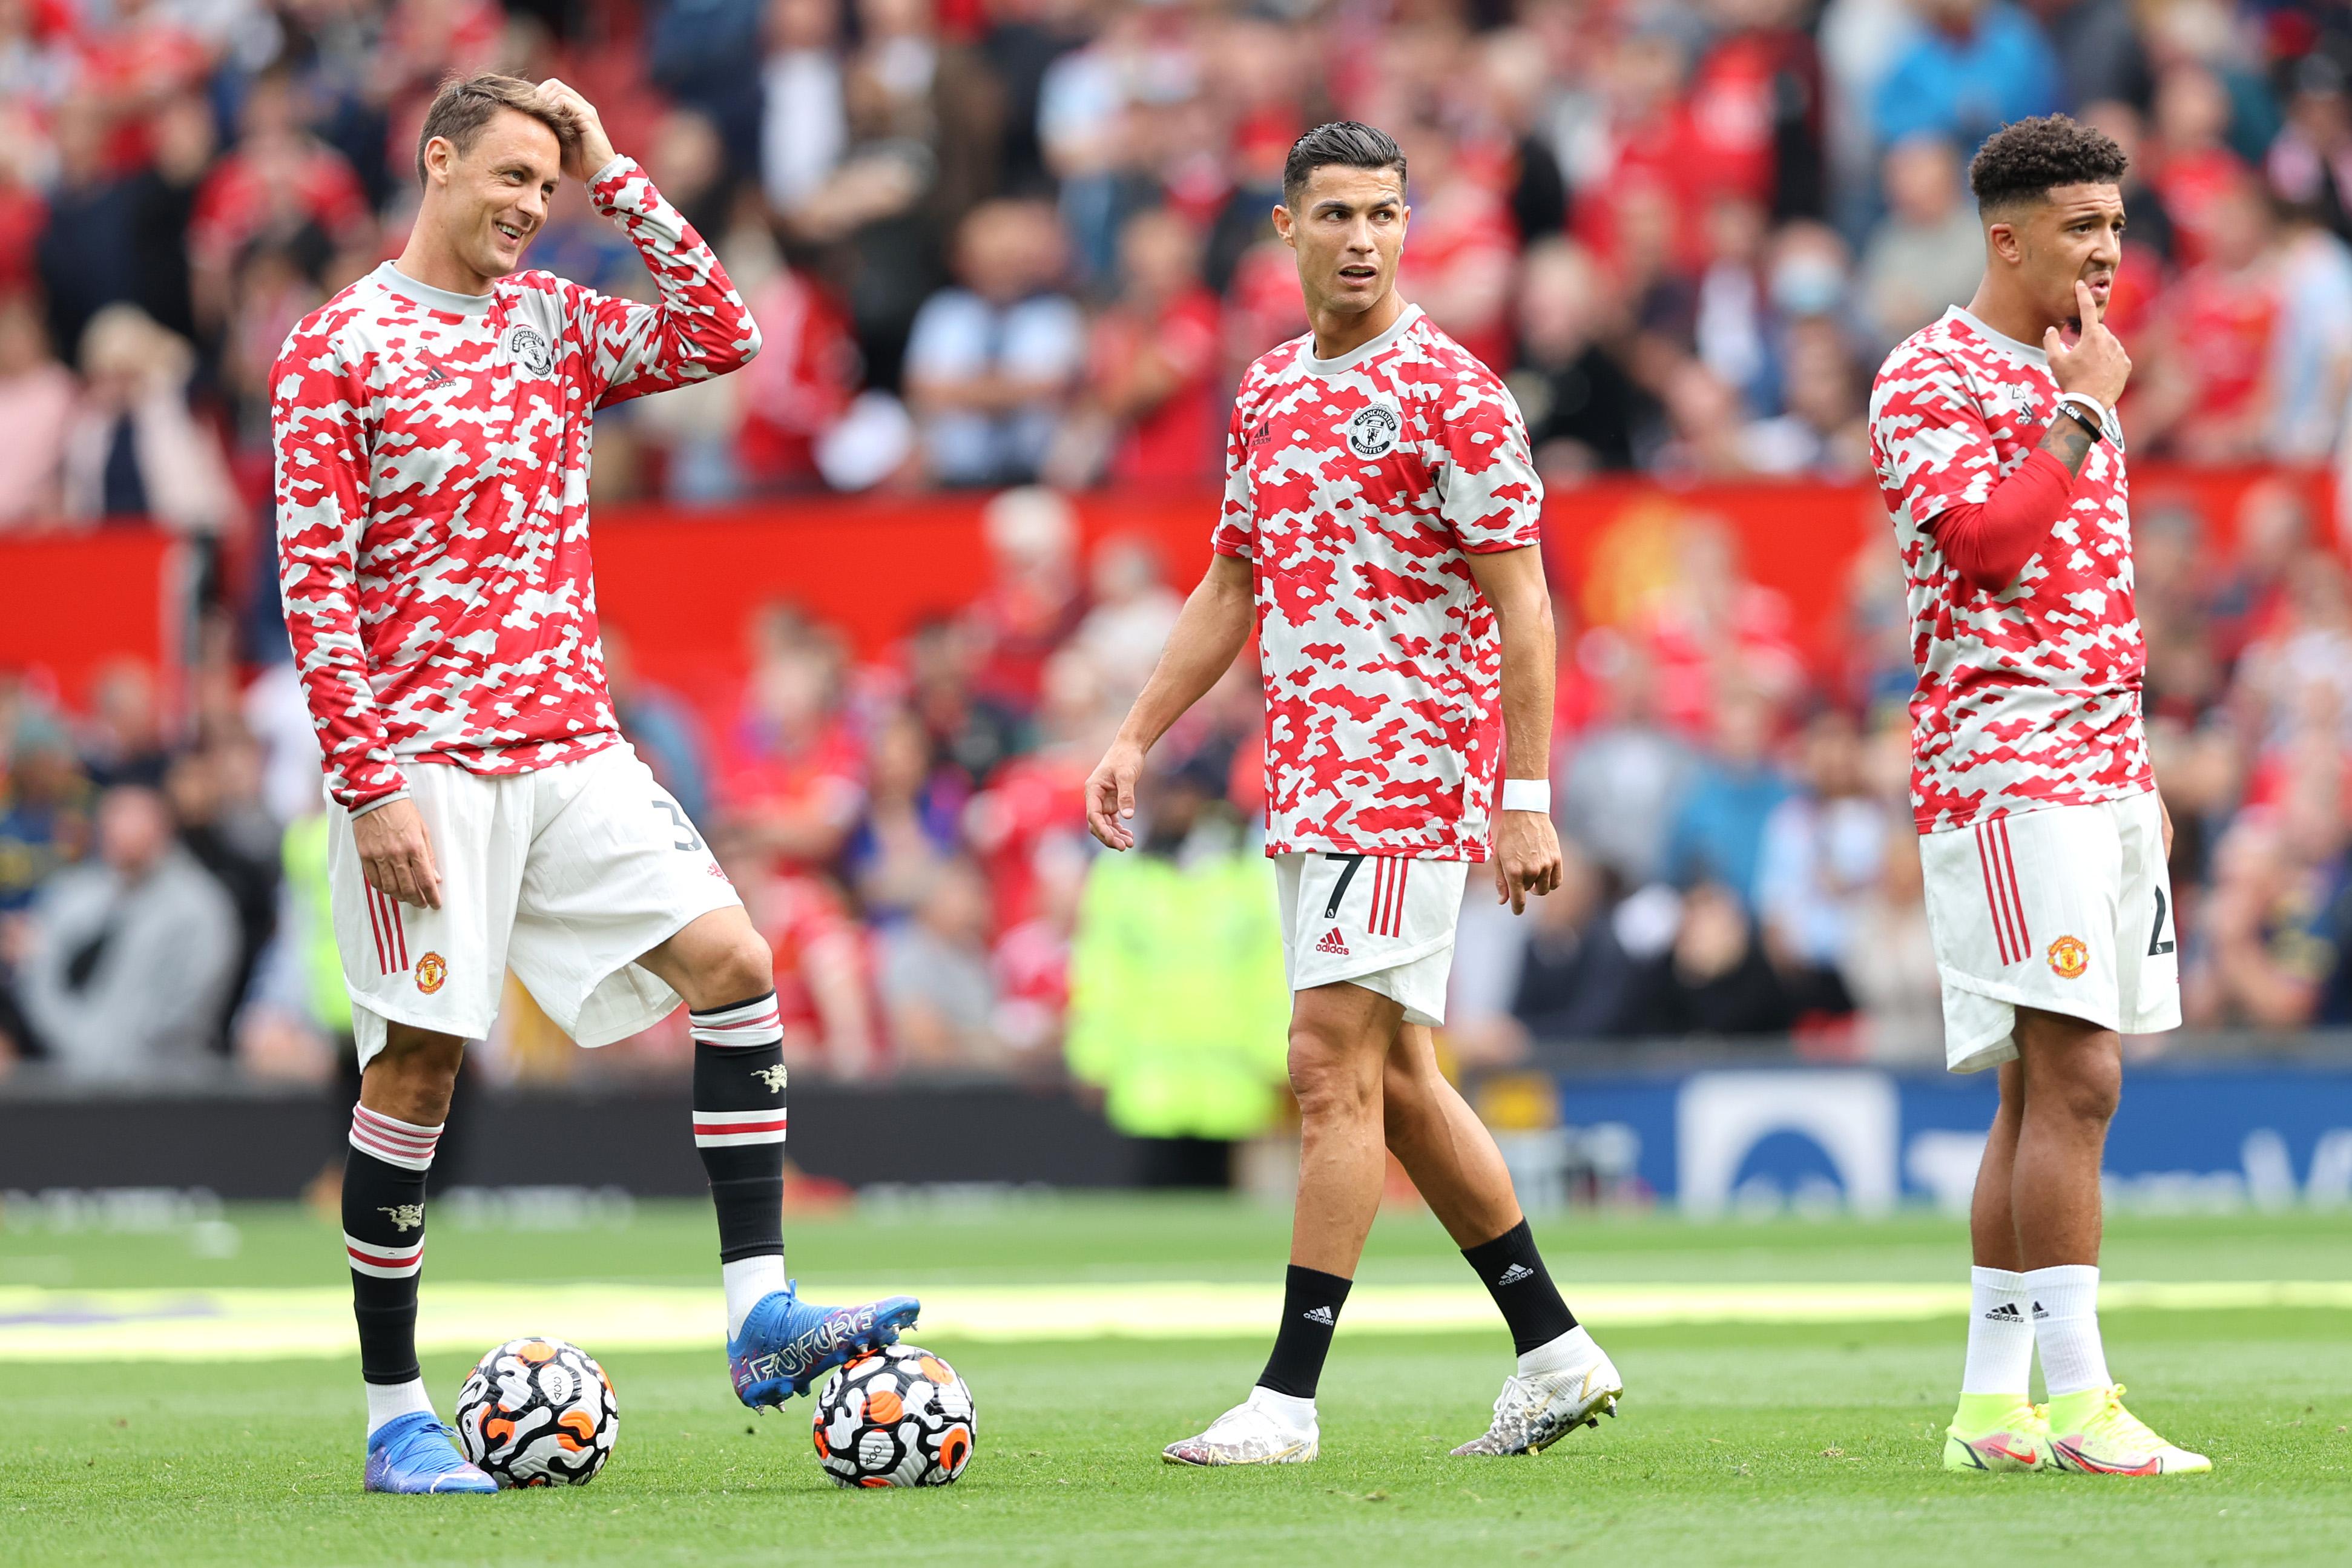 manchester-united-v-newcastle-united-premier-league.jpg